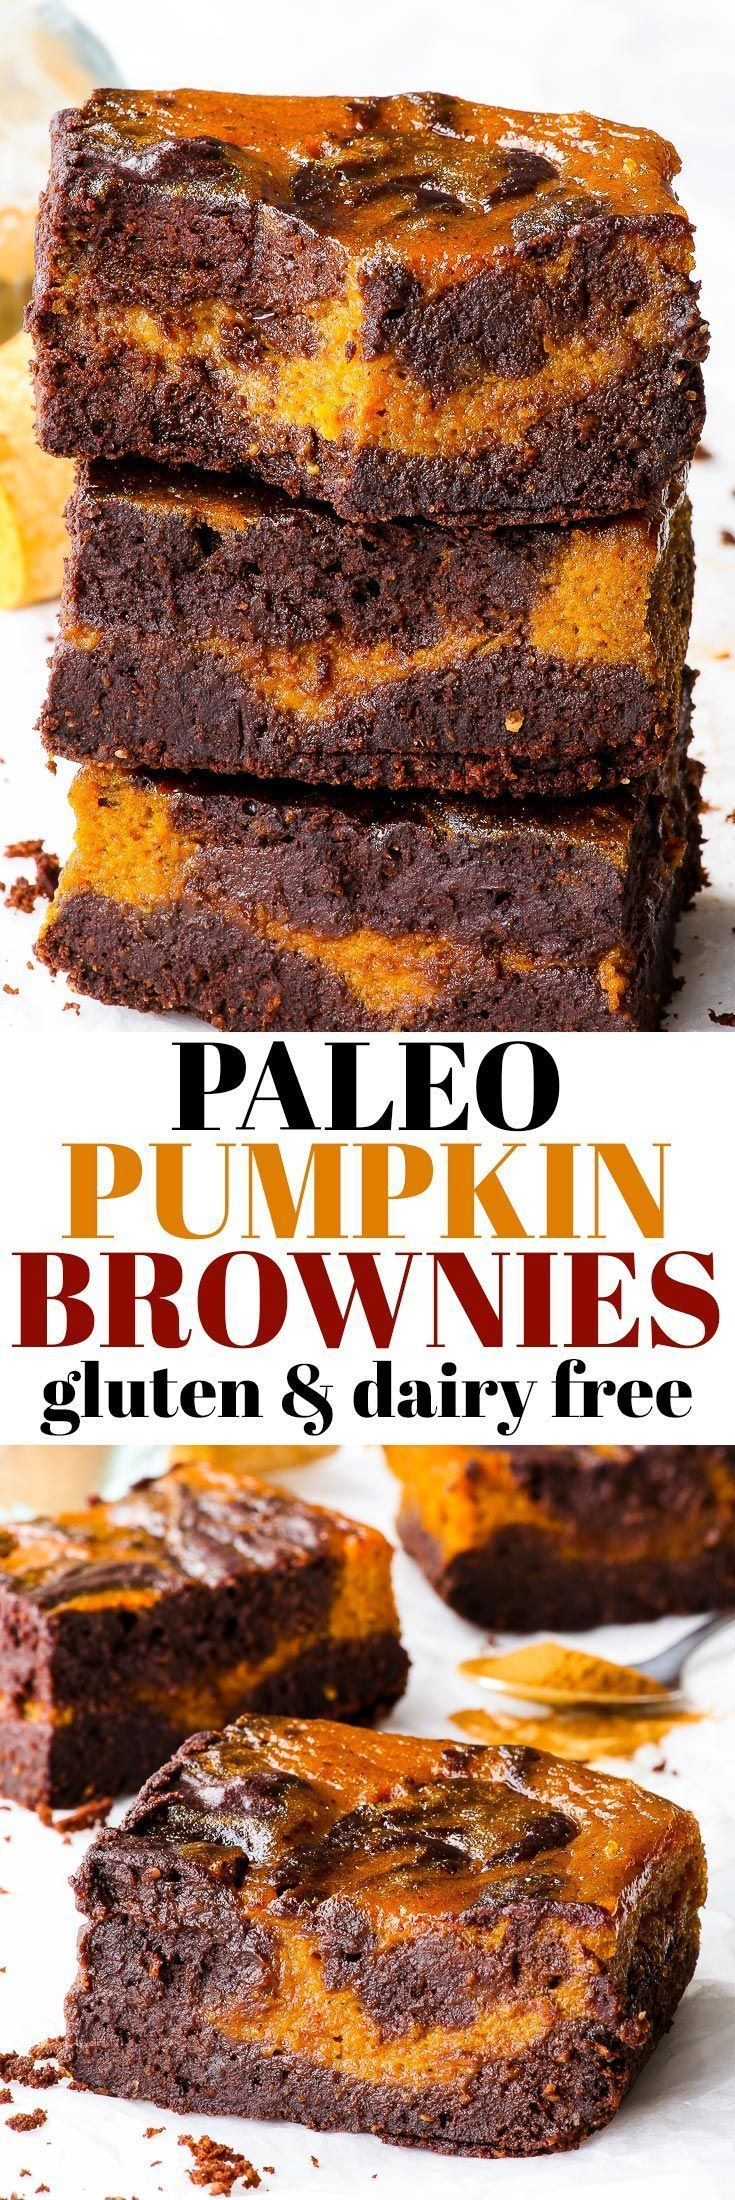 Flourless Paleo Pumpkin Brownies – The Loopy Whisk